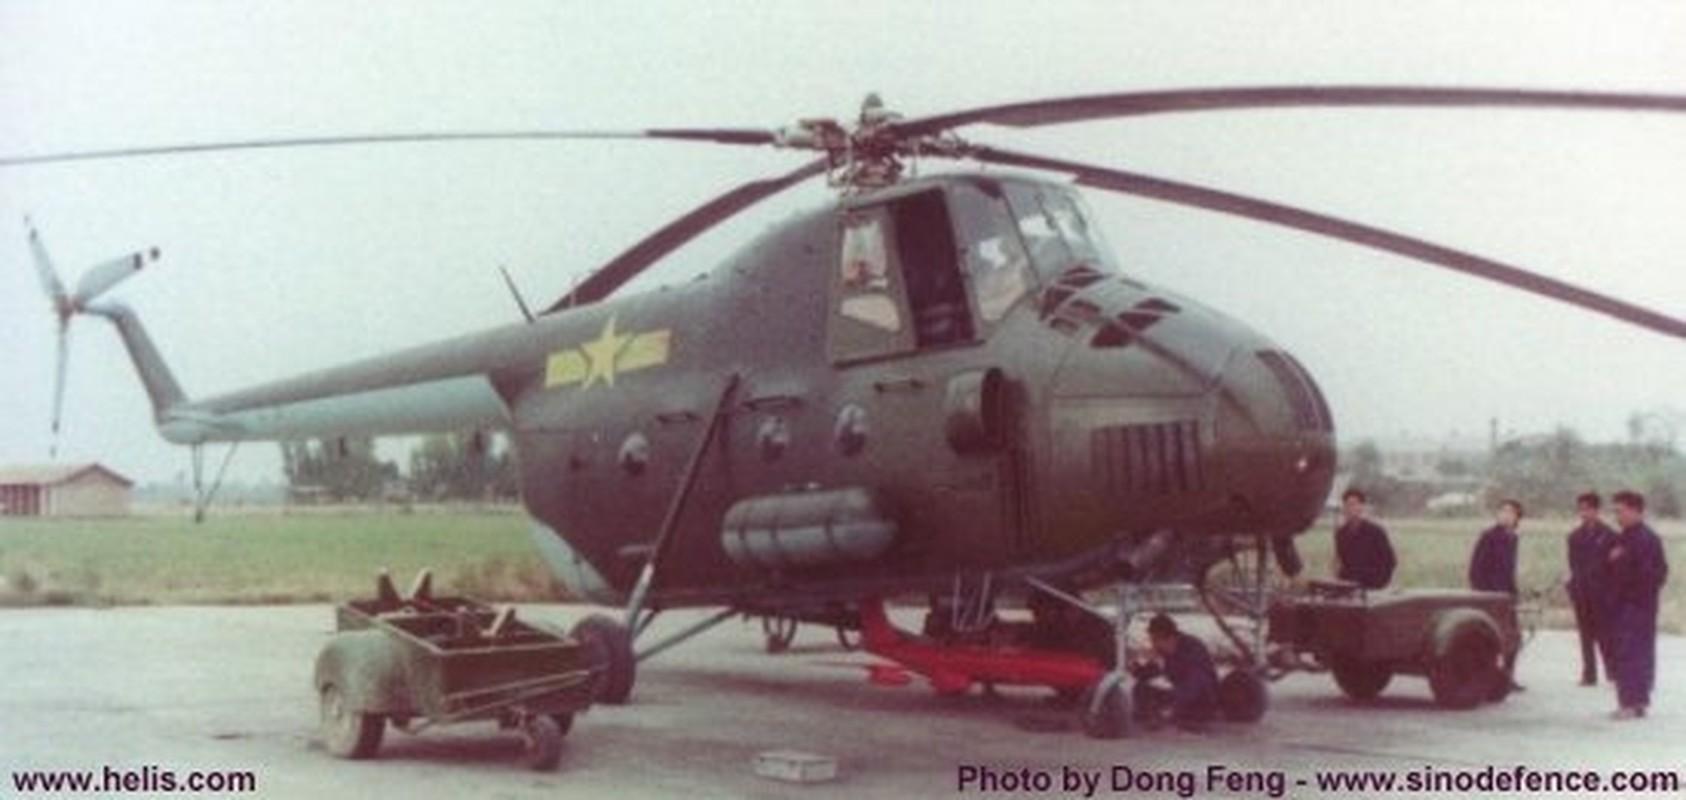 Ly do Trung Quoc khong the sao chep truc thang hang nang Lien Xo-Hinh-11